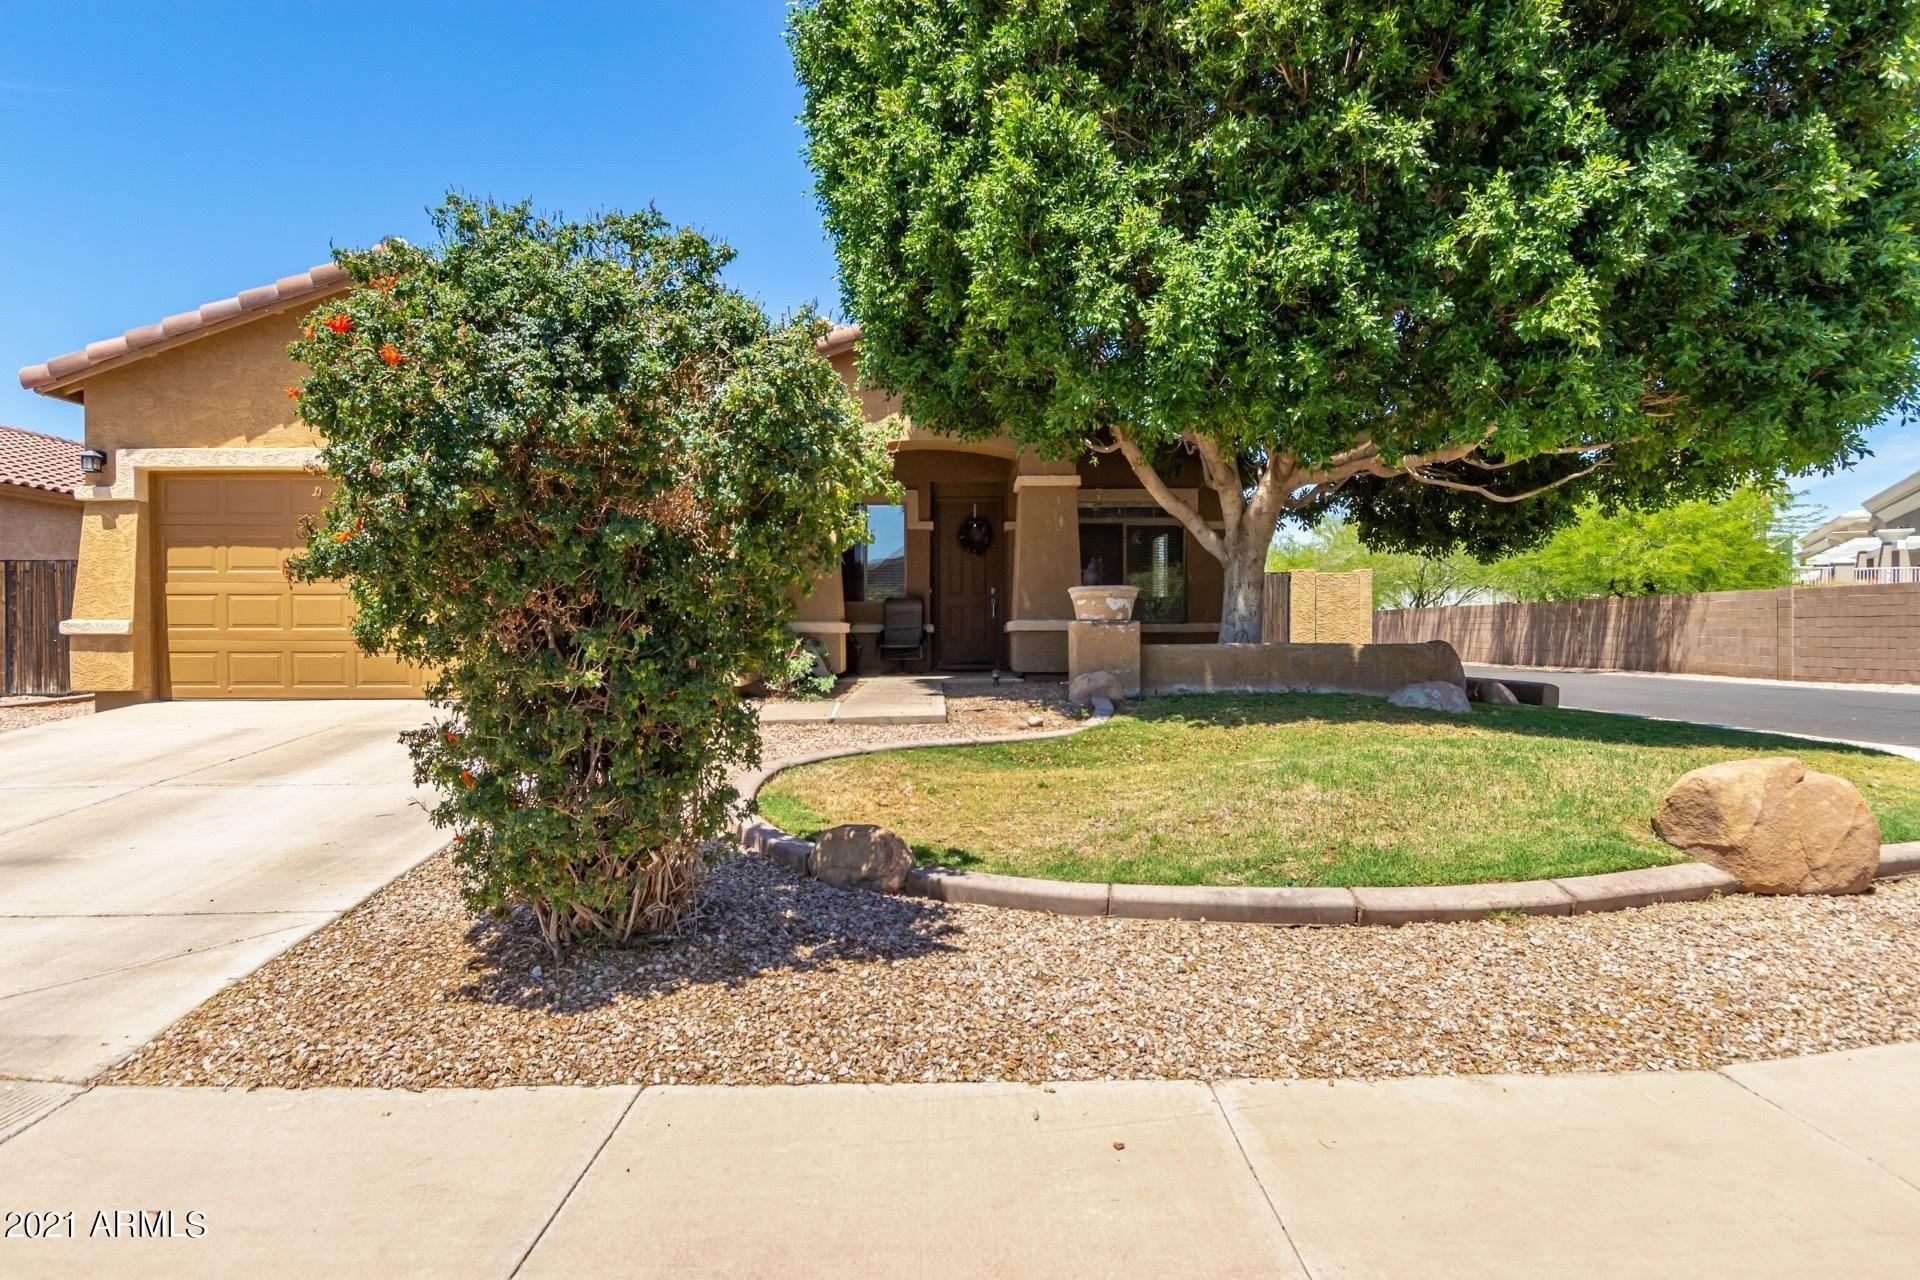 Photo of 9766 E JEROME Avenue, Mesa, AZ 85209 (MLS # 6232521)